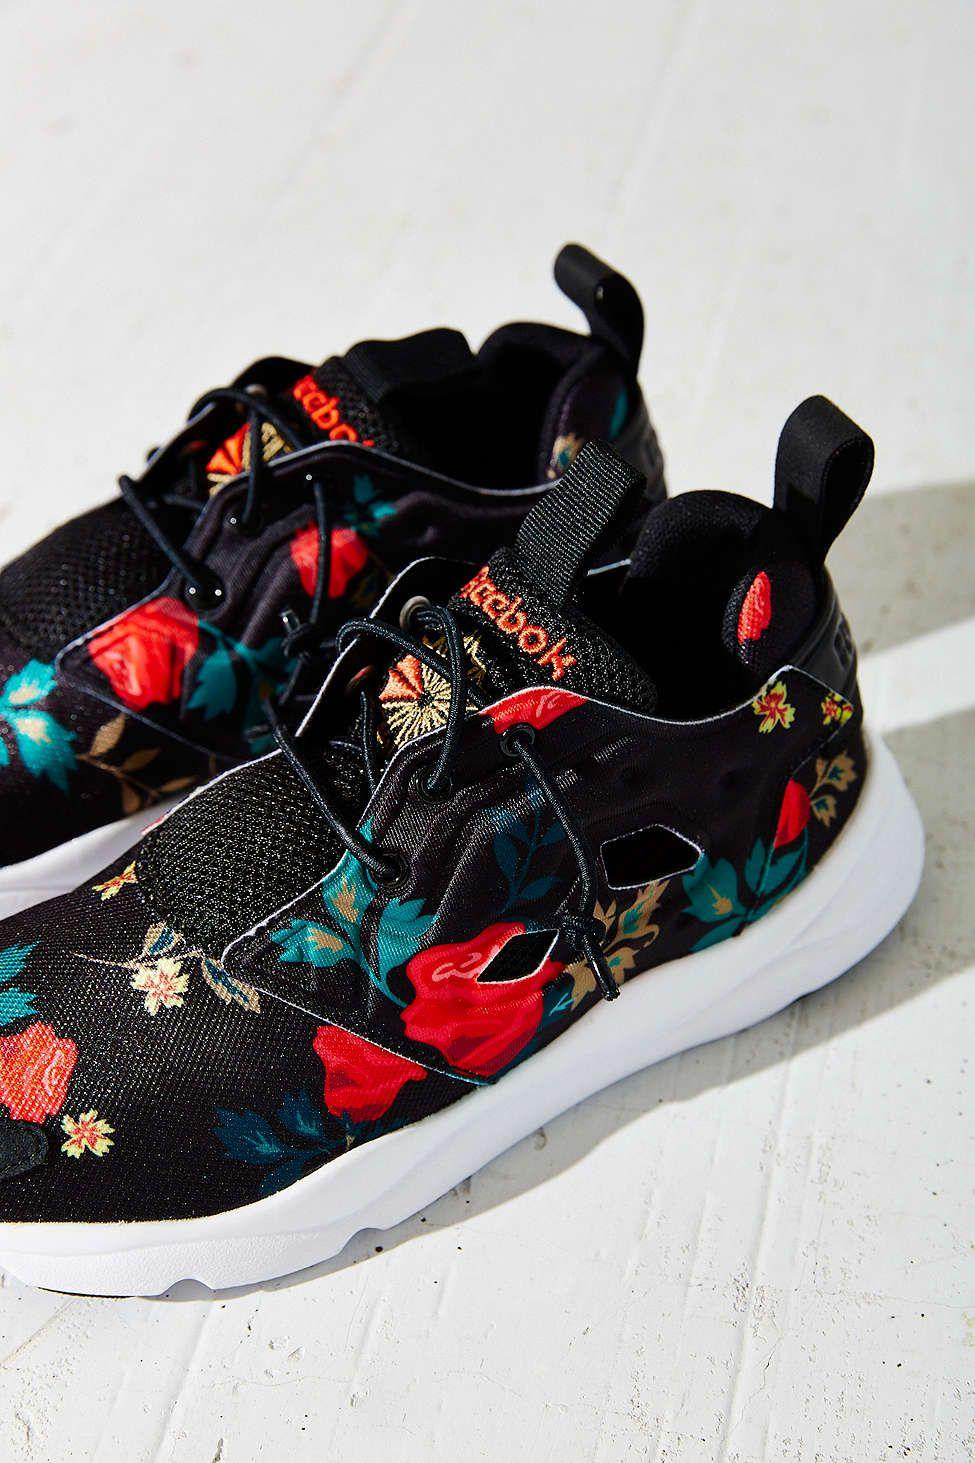 c48e571f1b1 Reebok Furylite Roses Runner Sneaker - Urban Outfitters